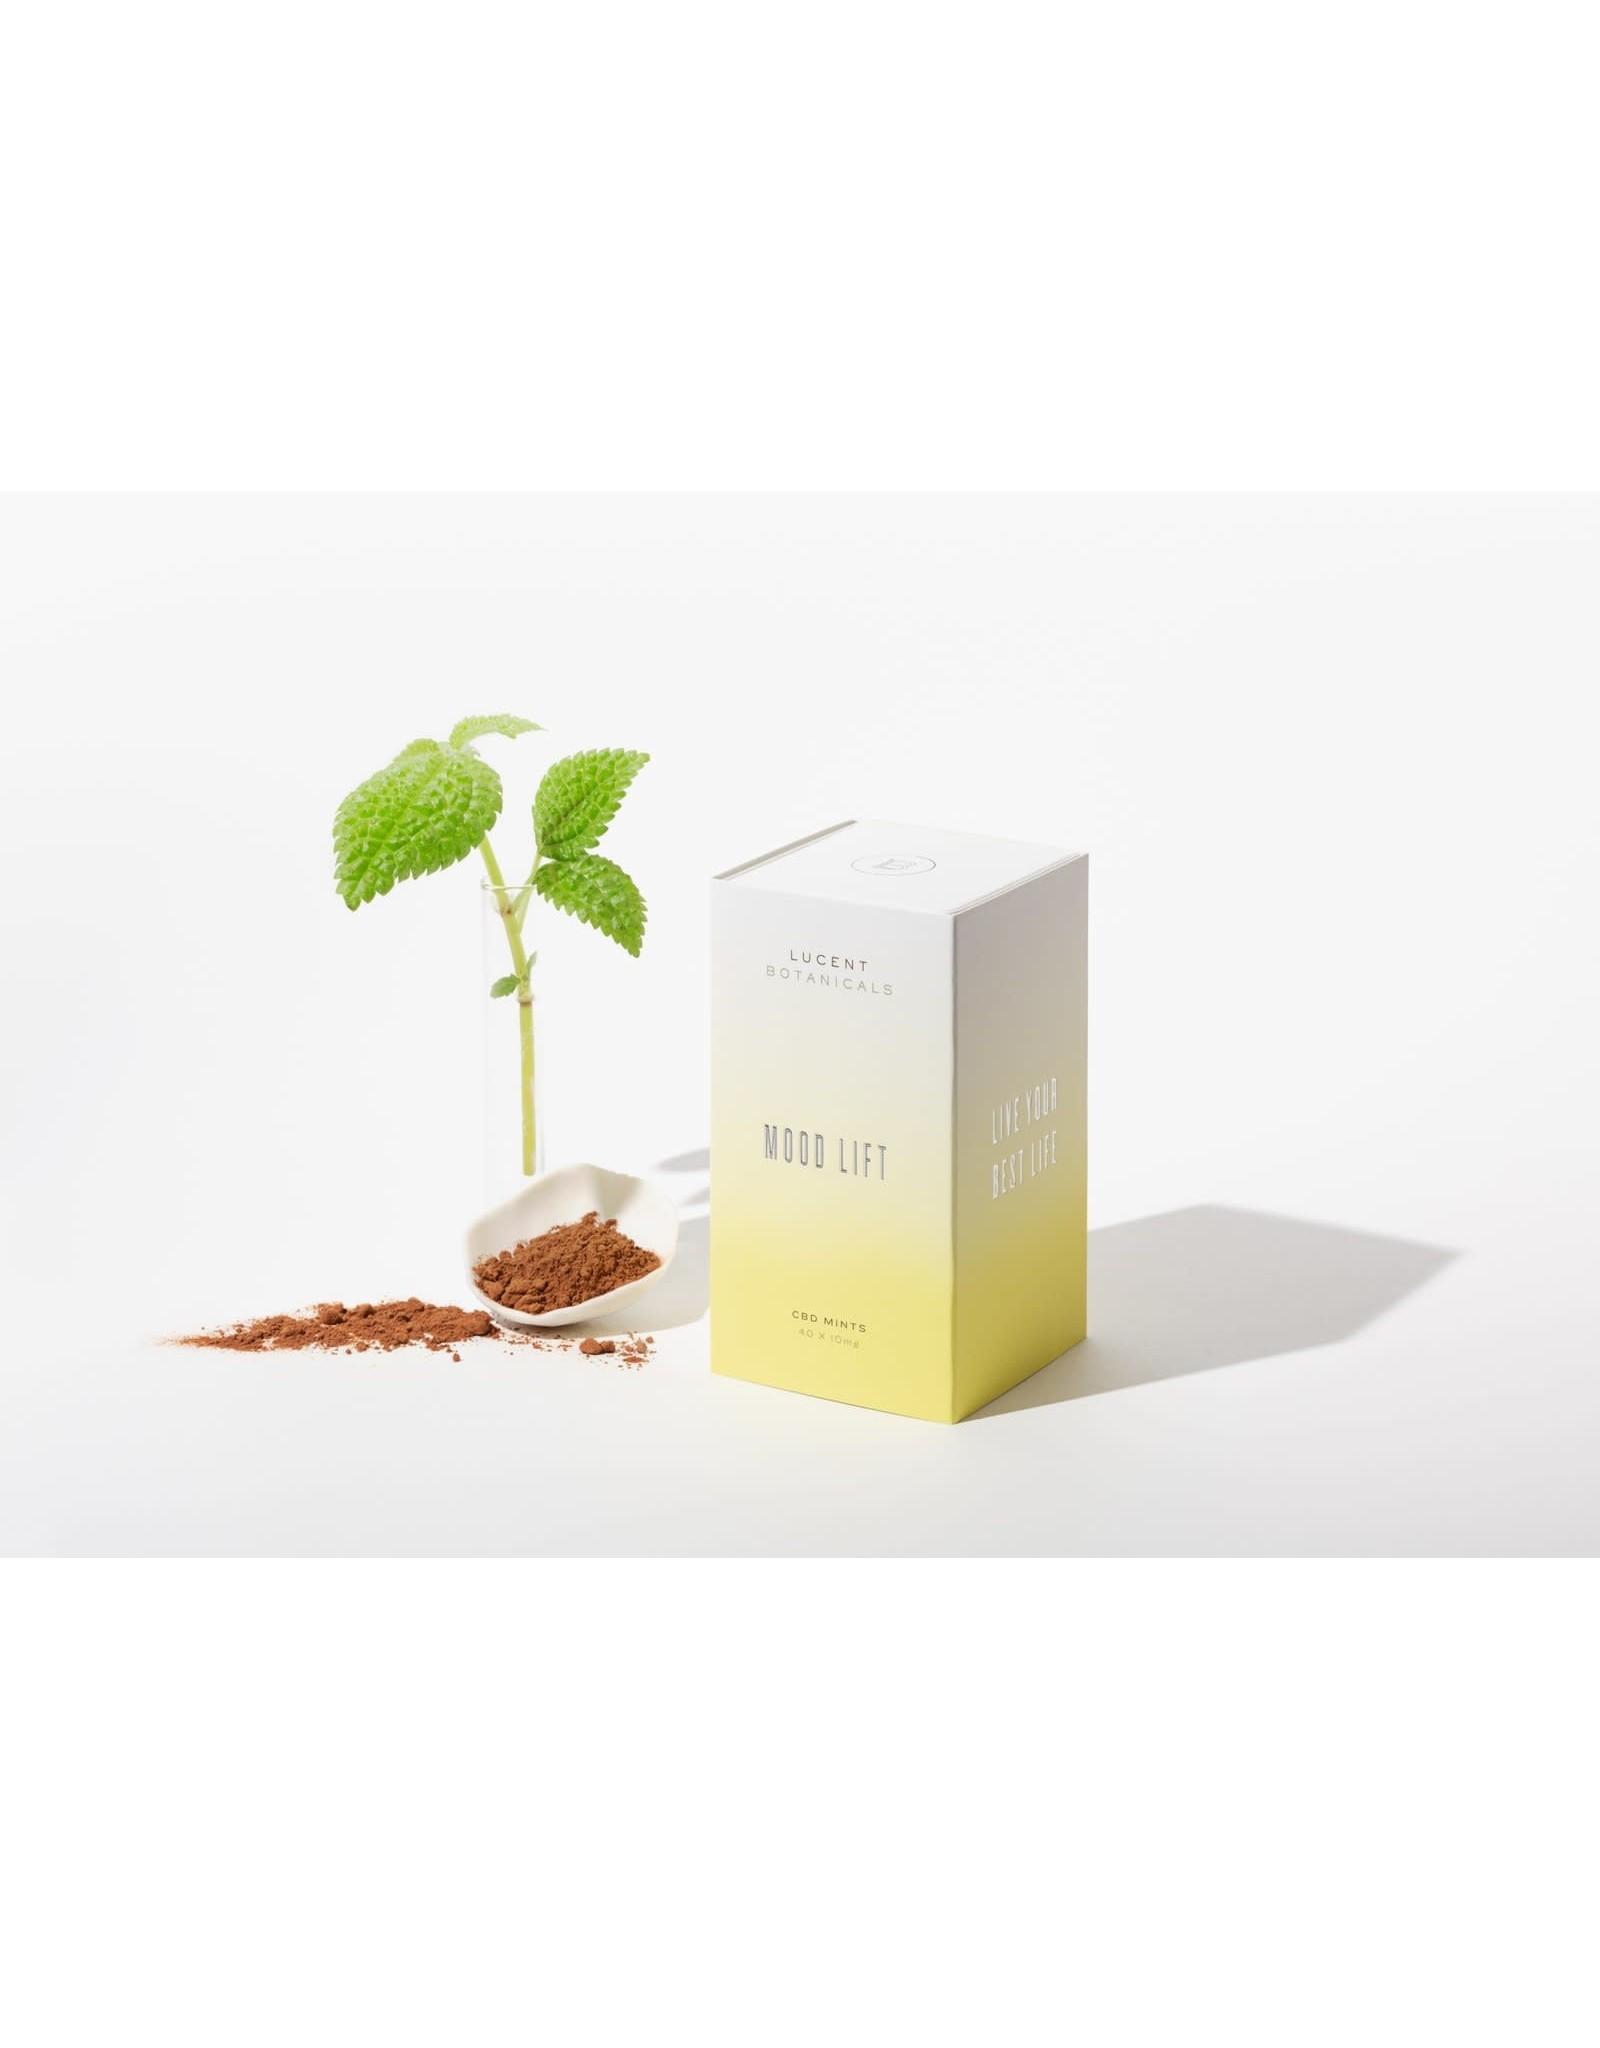 Lucent Botanicals Lucent Botanicals Mood Lift Mints 10mg 40ct